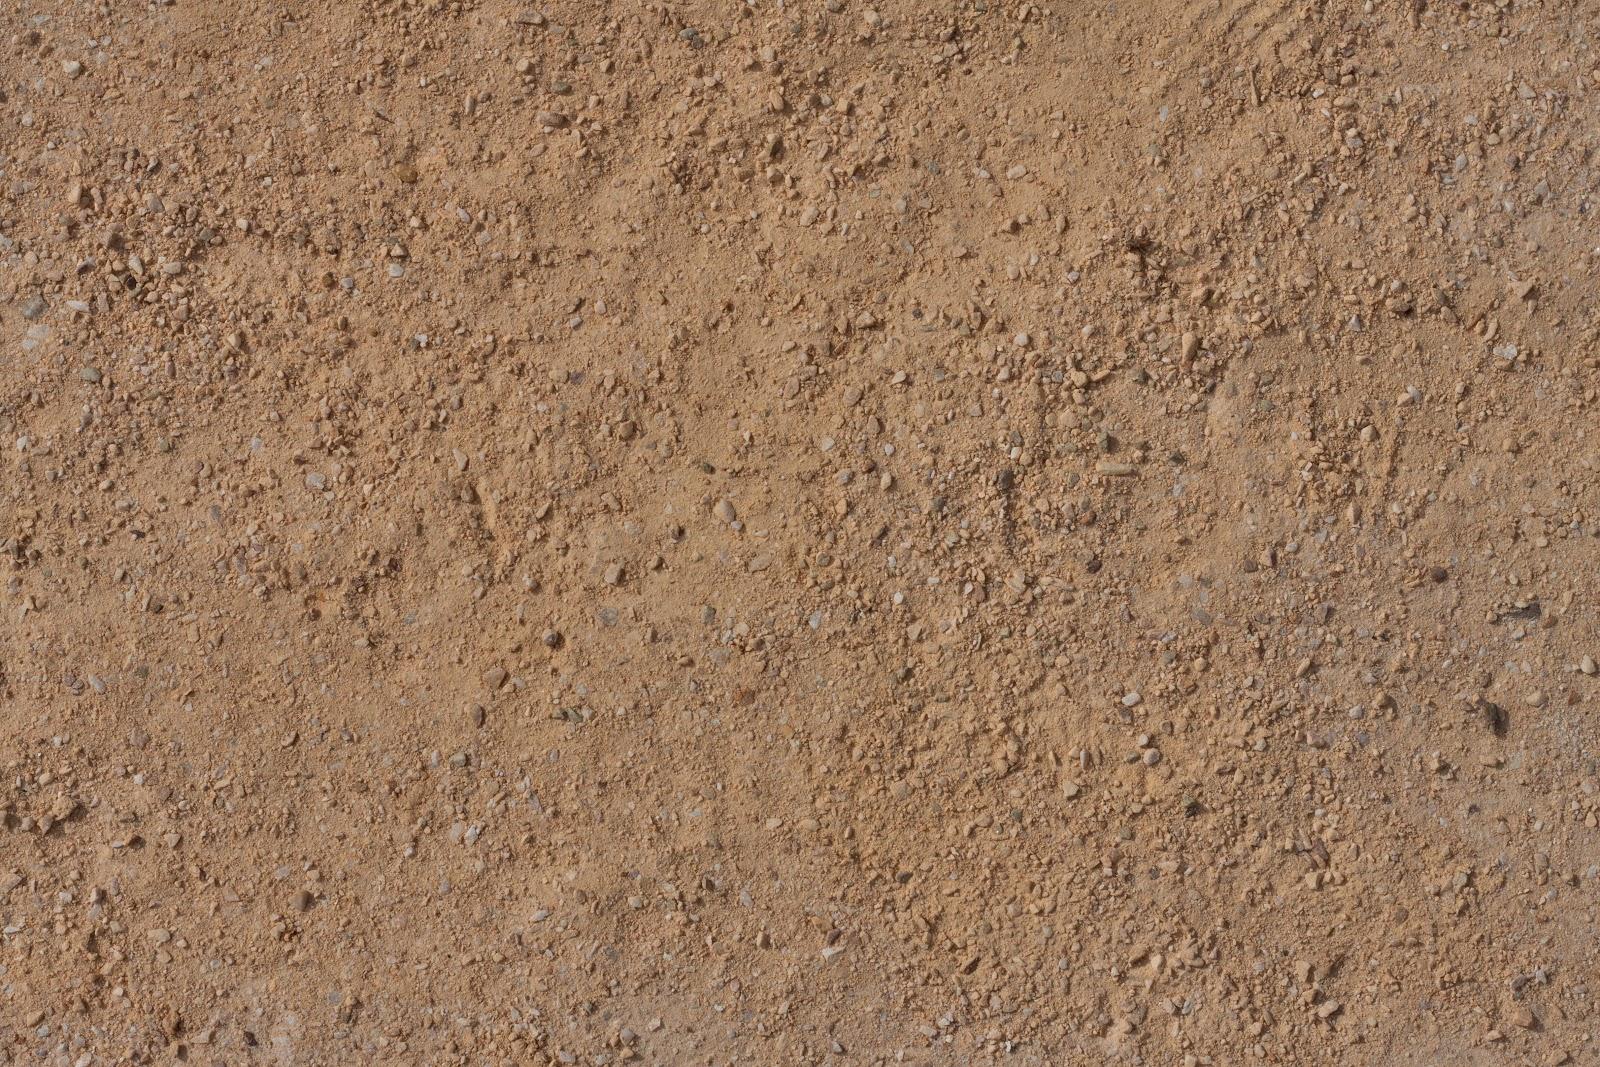 Textures architecture roads roads dirt road texture seamless - High Resolution Seamless Textures Orange Dirt Dirt Path Texture Seamless